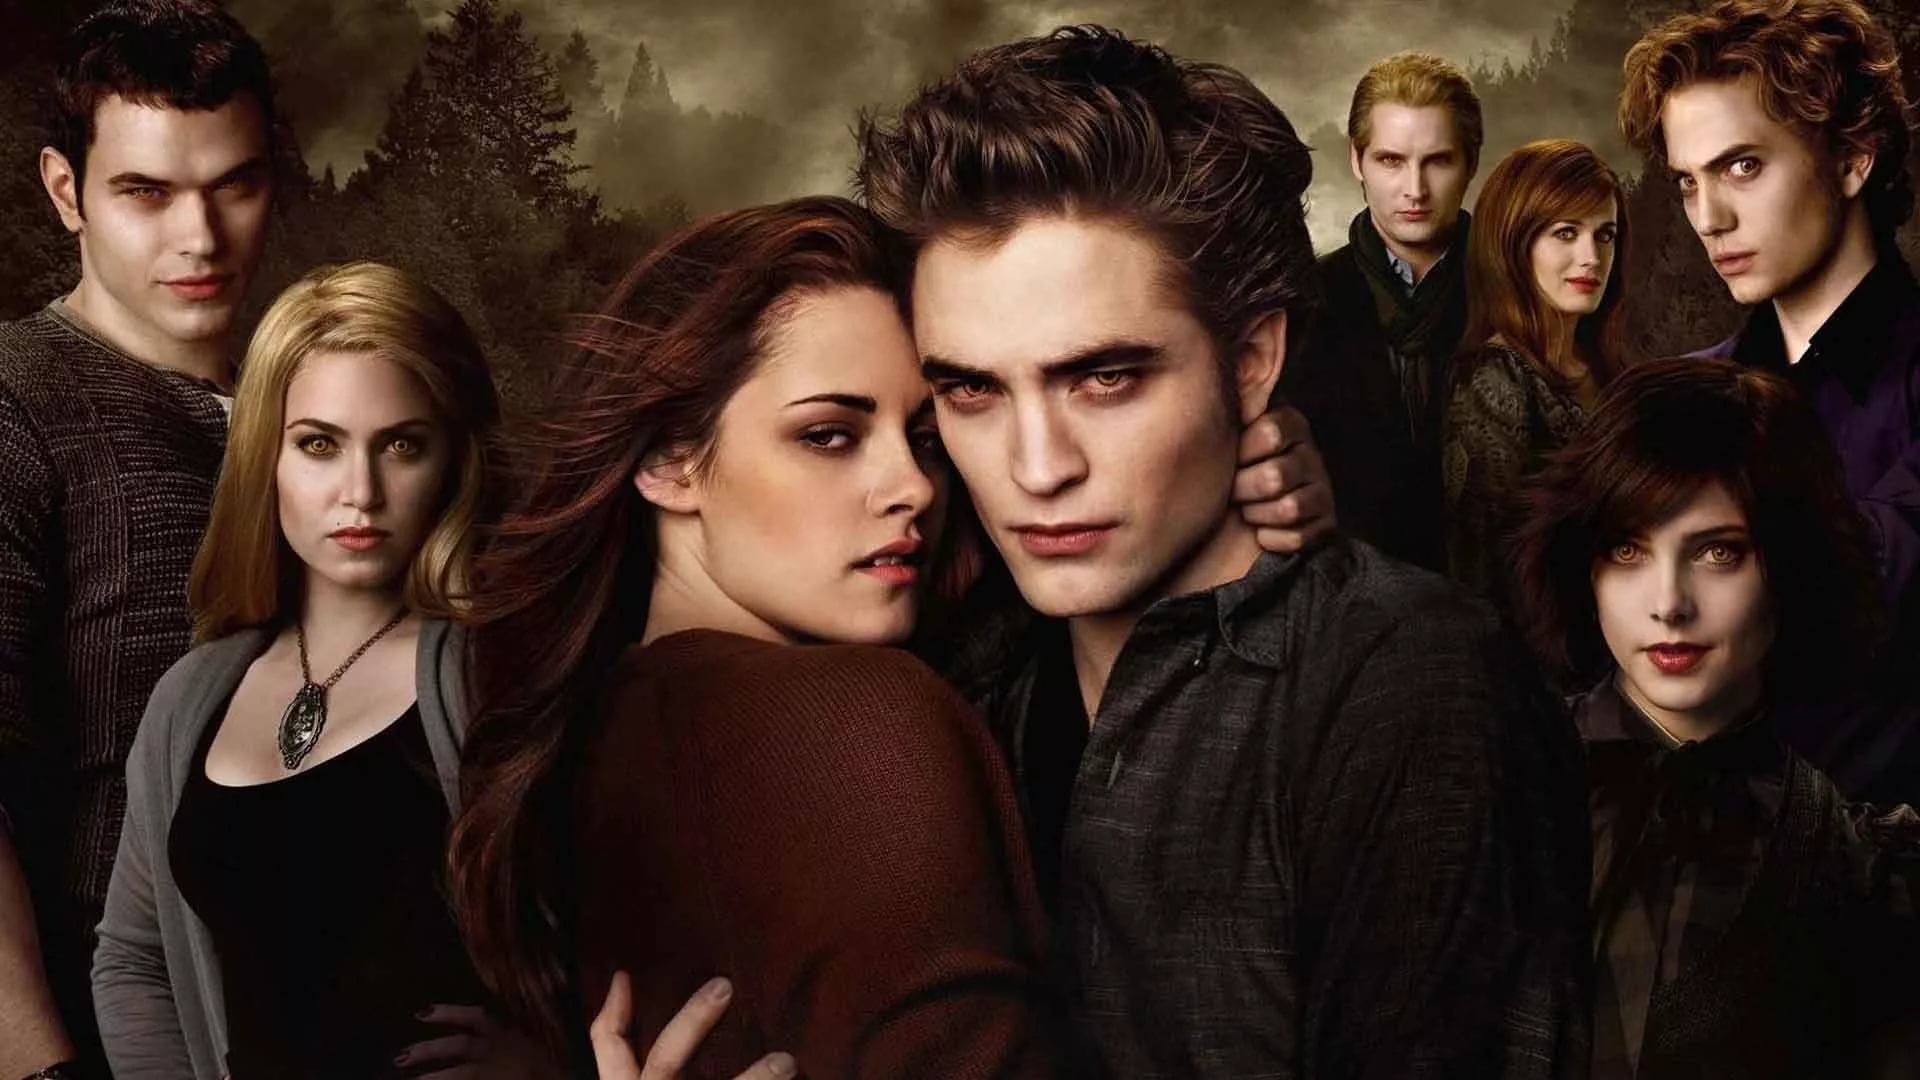 Twilight Saga wallpaper photo